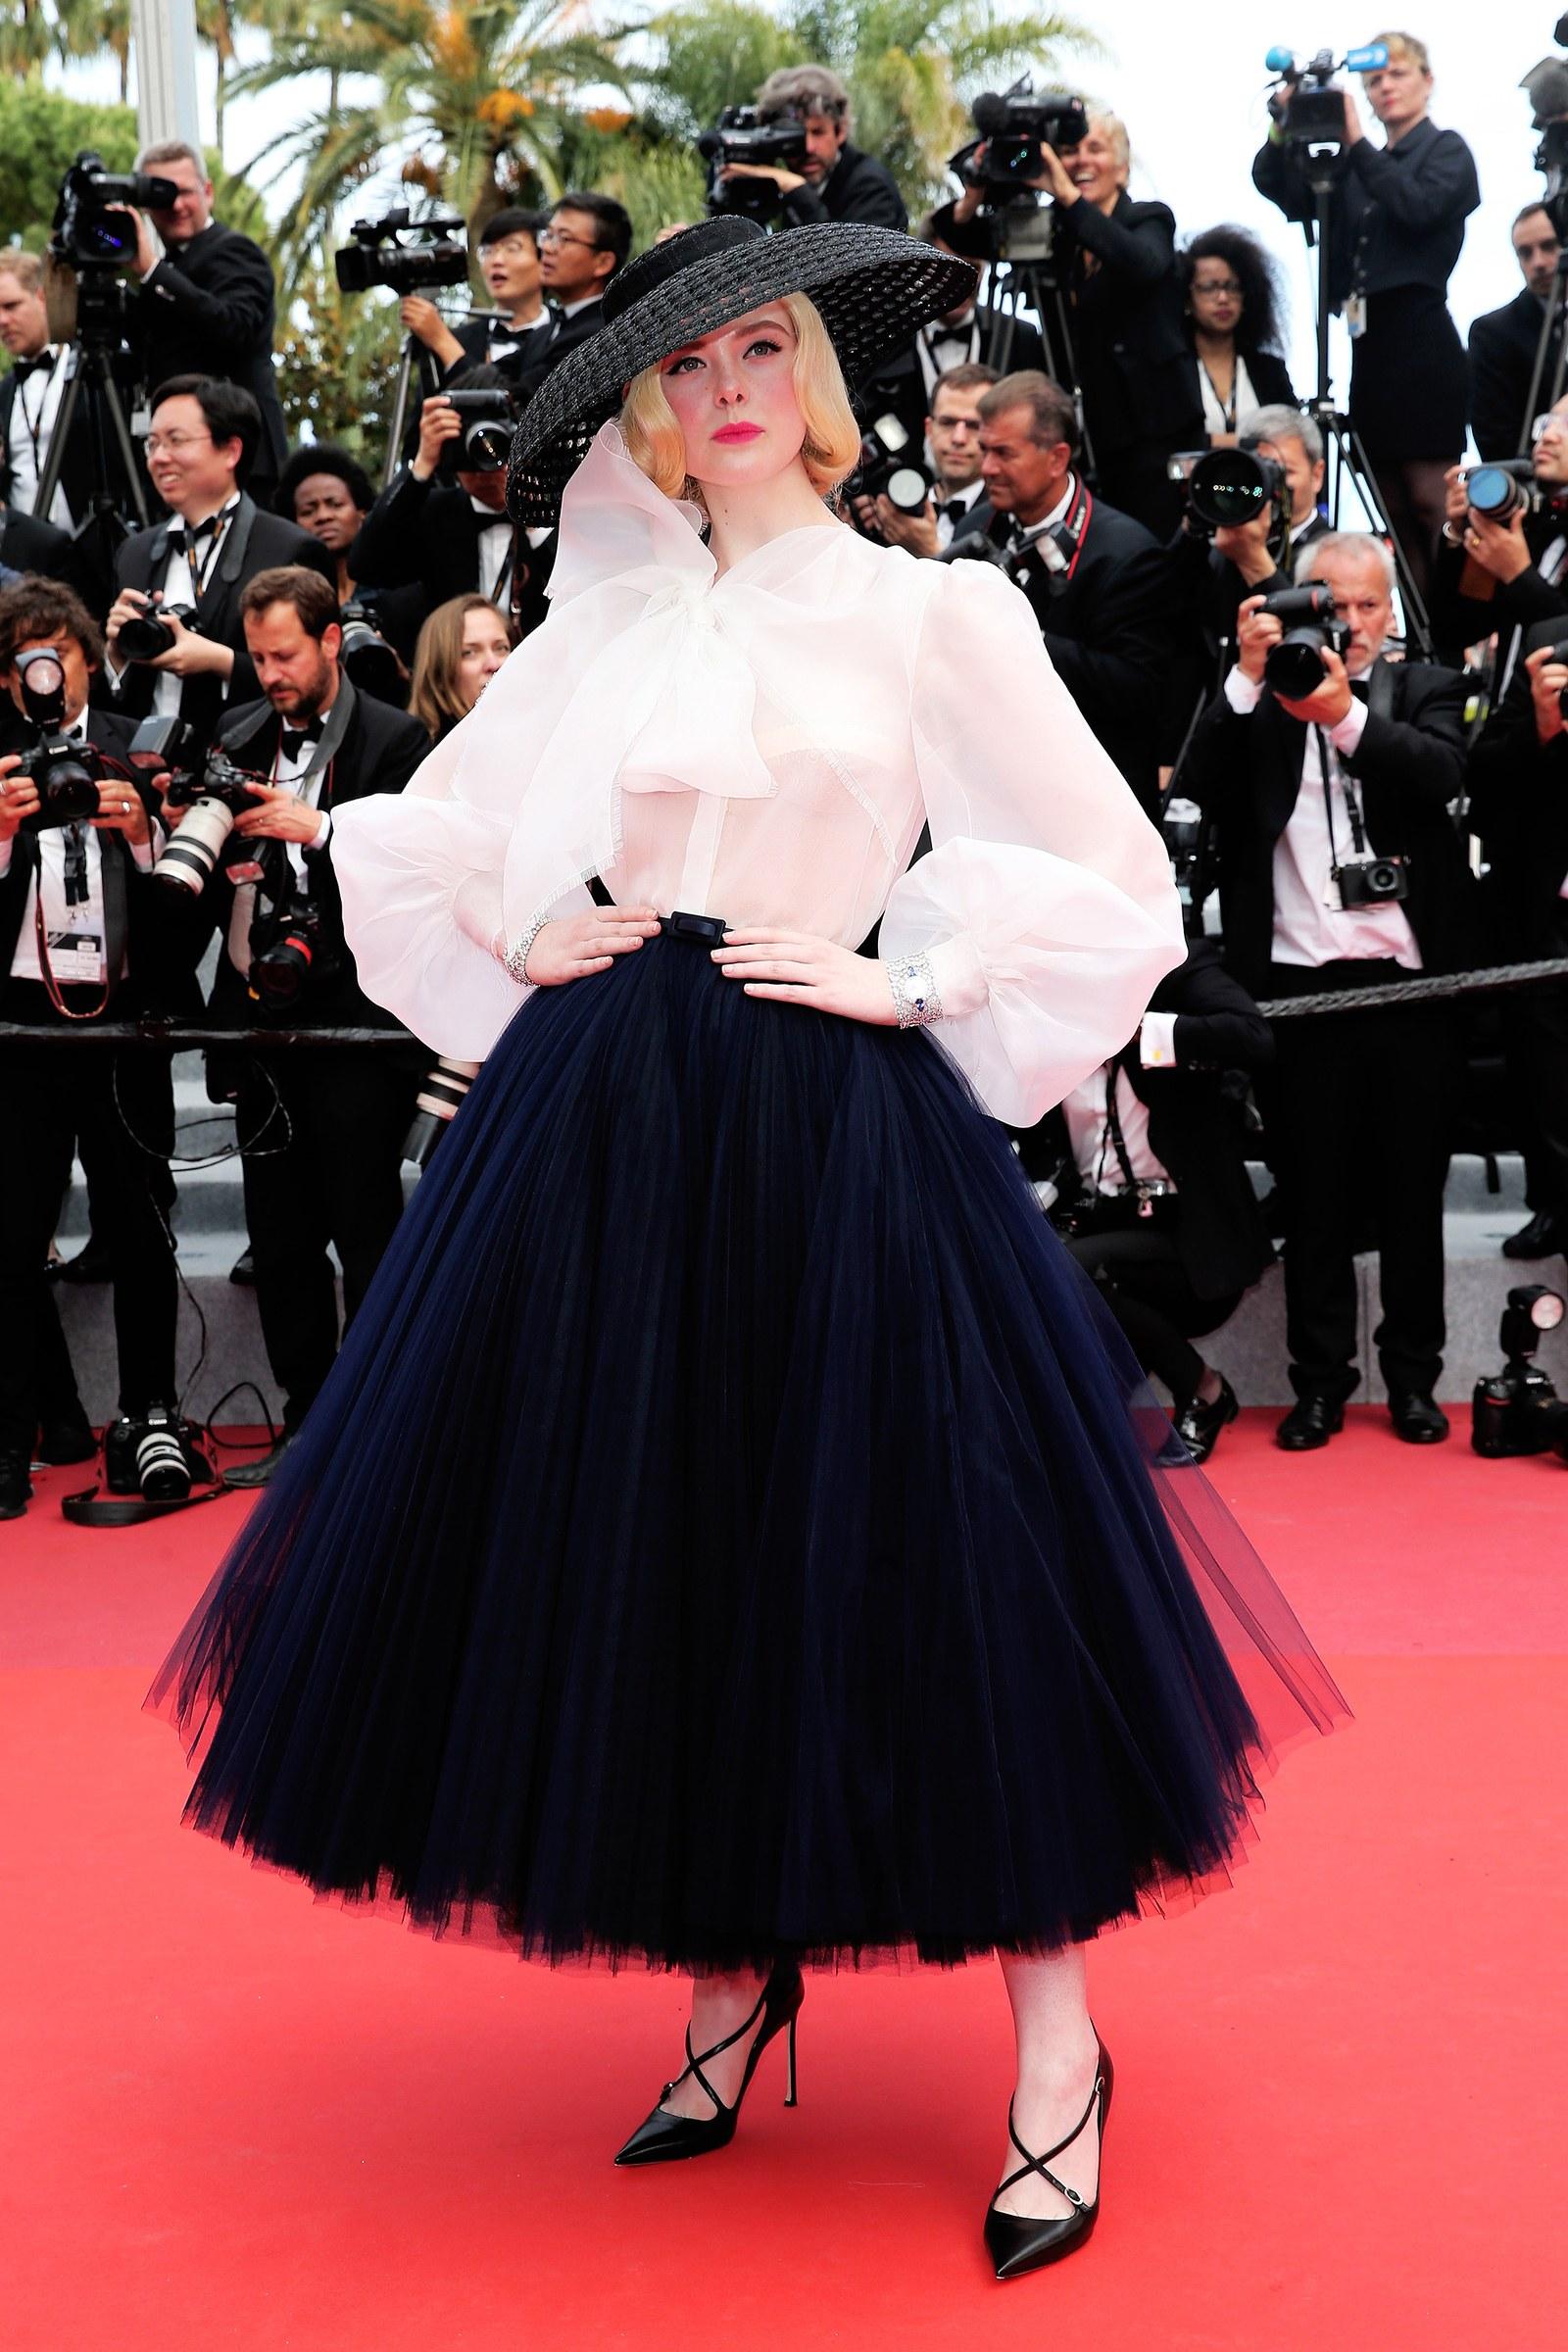 sale retailer 0dc99 502dc Cannes 2019: Elle Fanning magnifica in Dior, l'abito ...